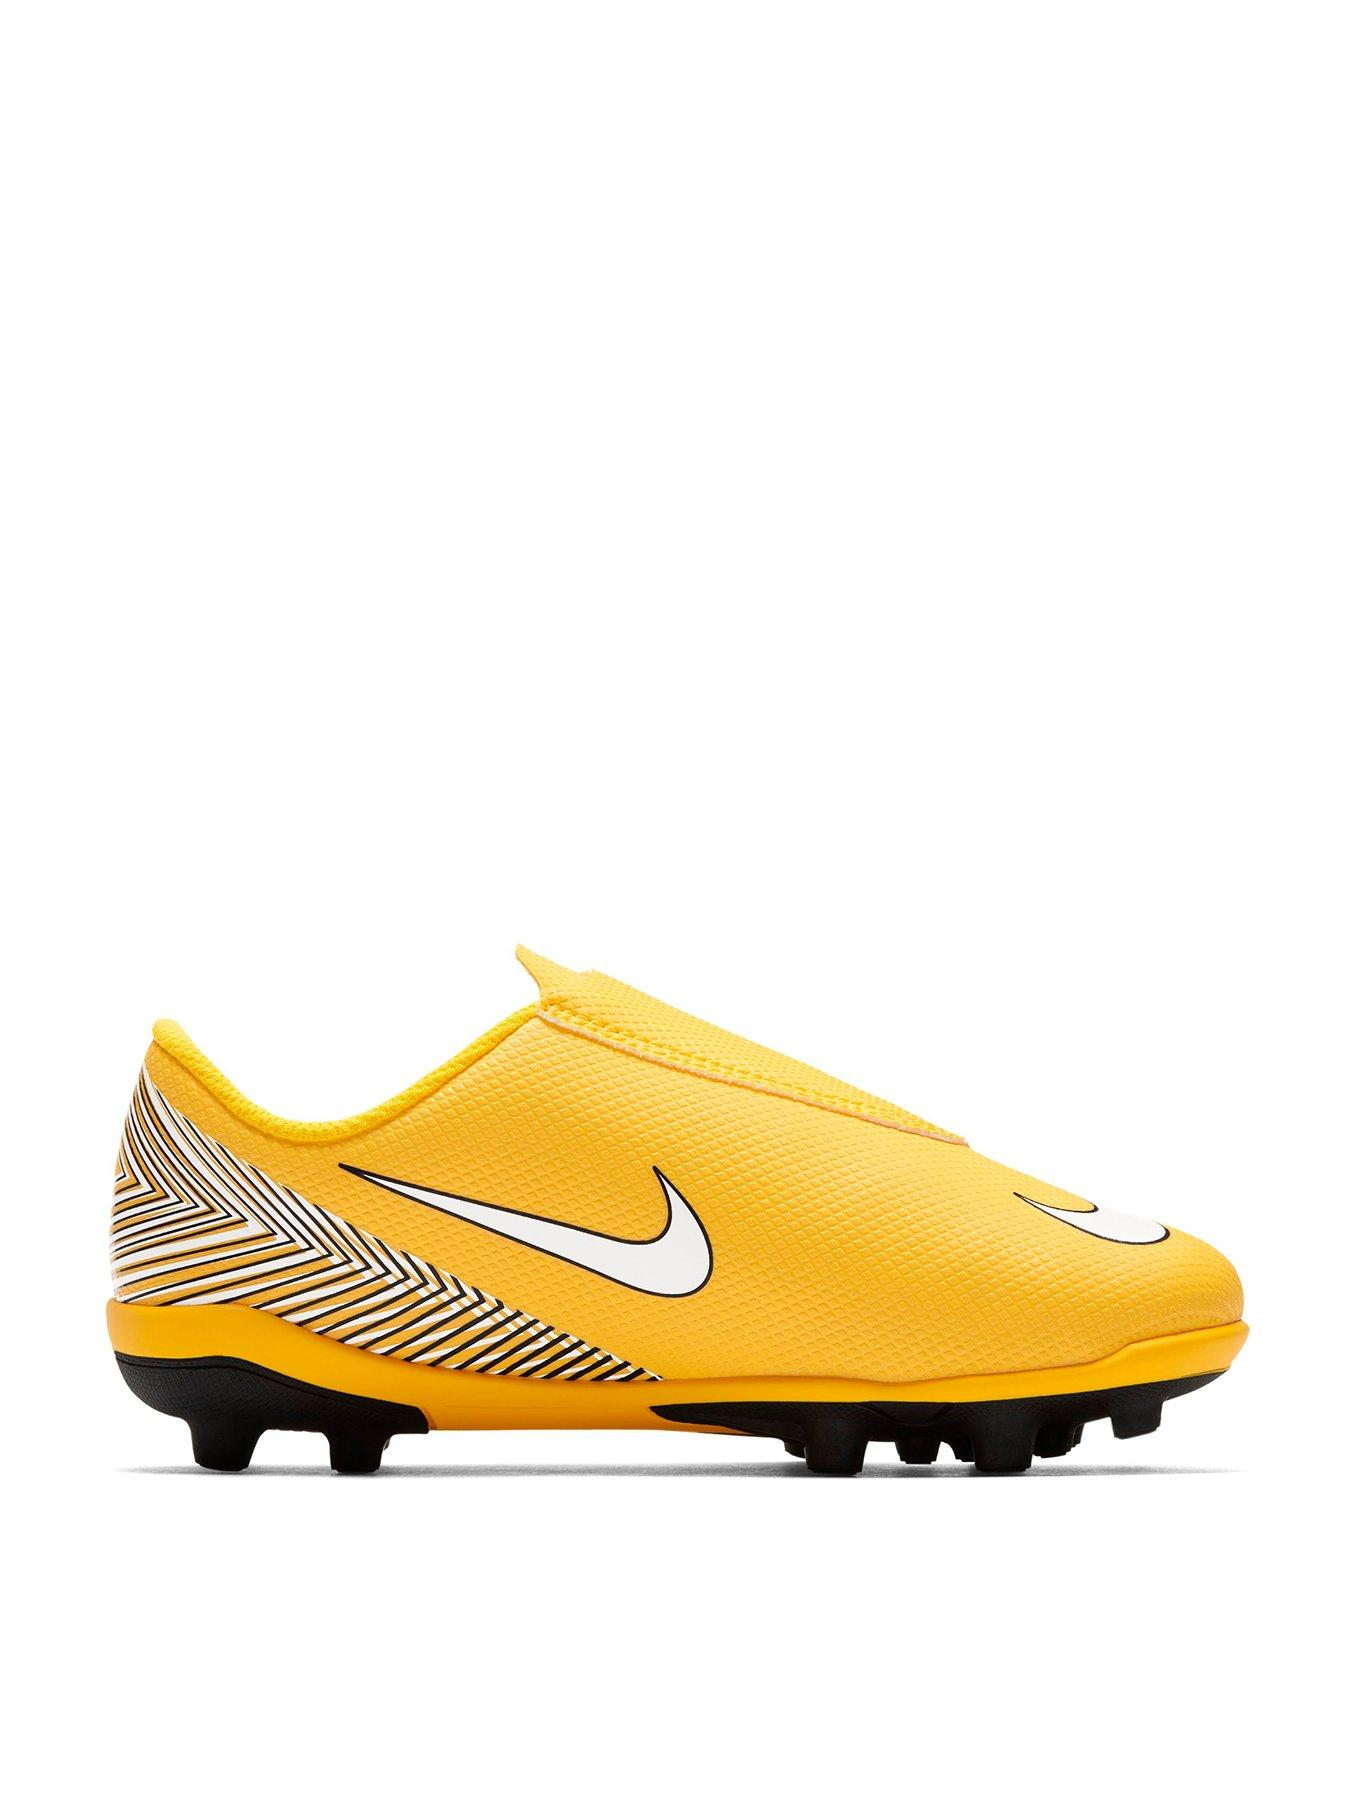 new styles b0005 ee711 ... best price nike junior vapour club v neymar mg football boot yellow  black c5cf0 13fe5